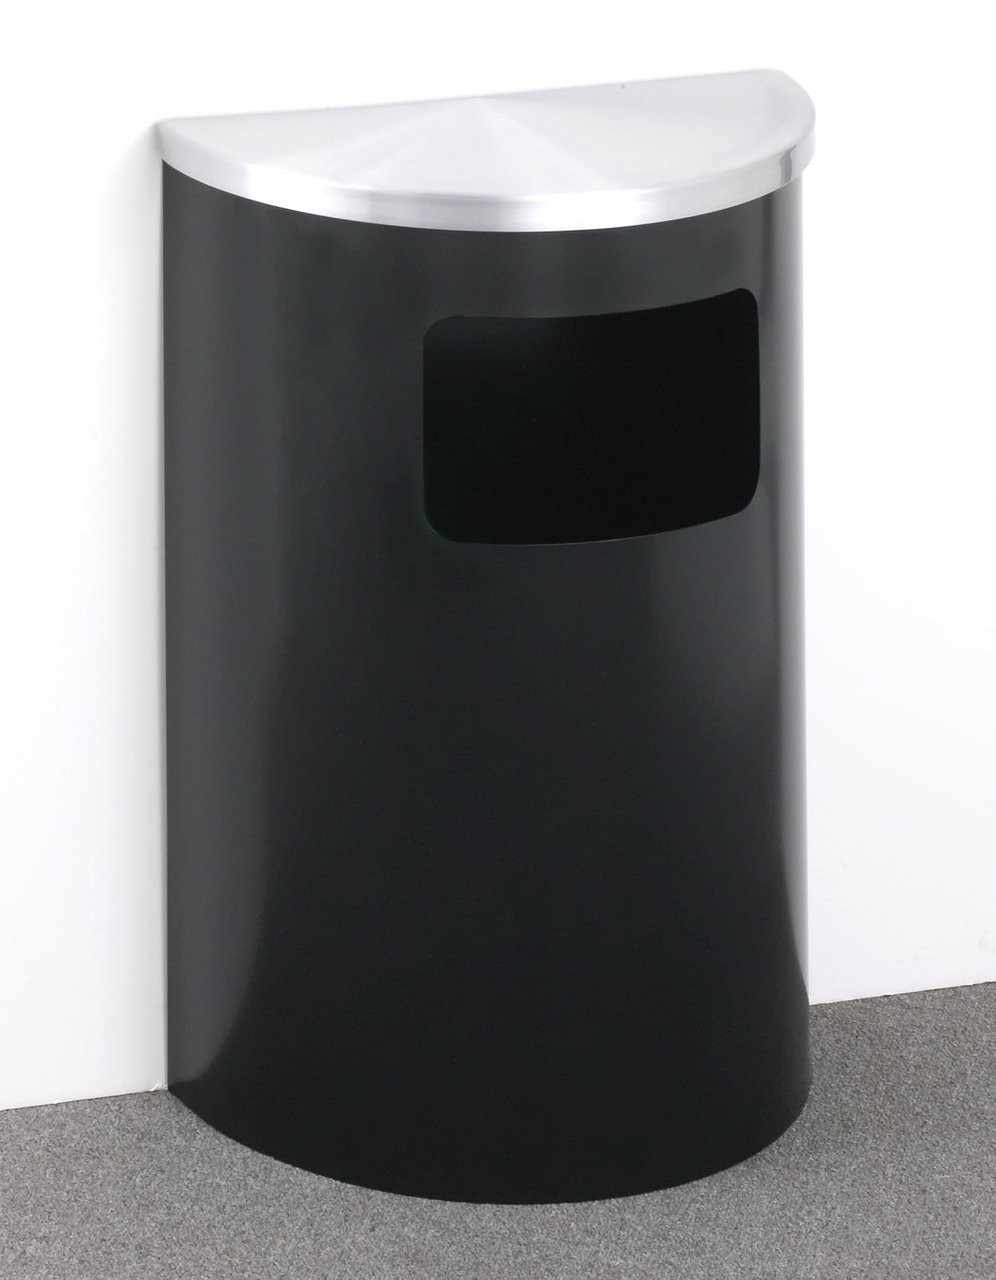 Satin Black with Satin Aluminum Lid